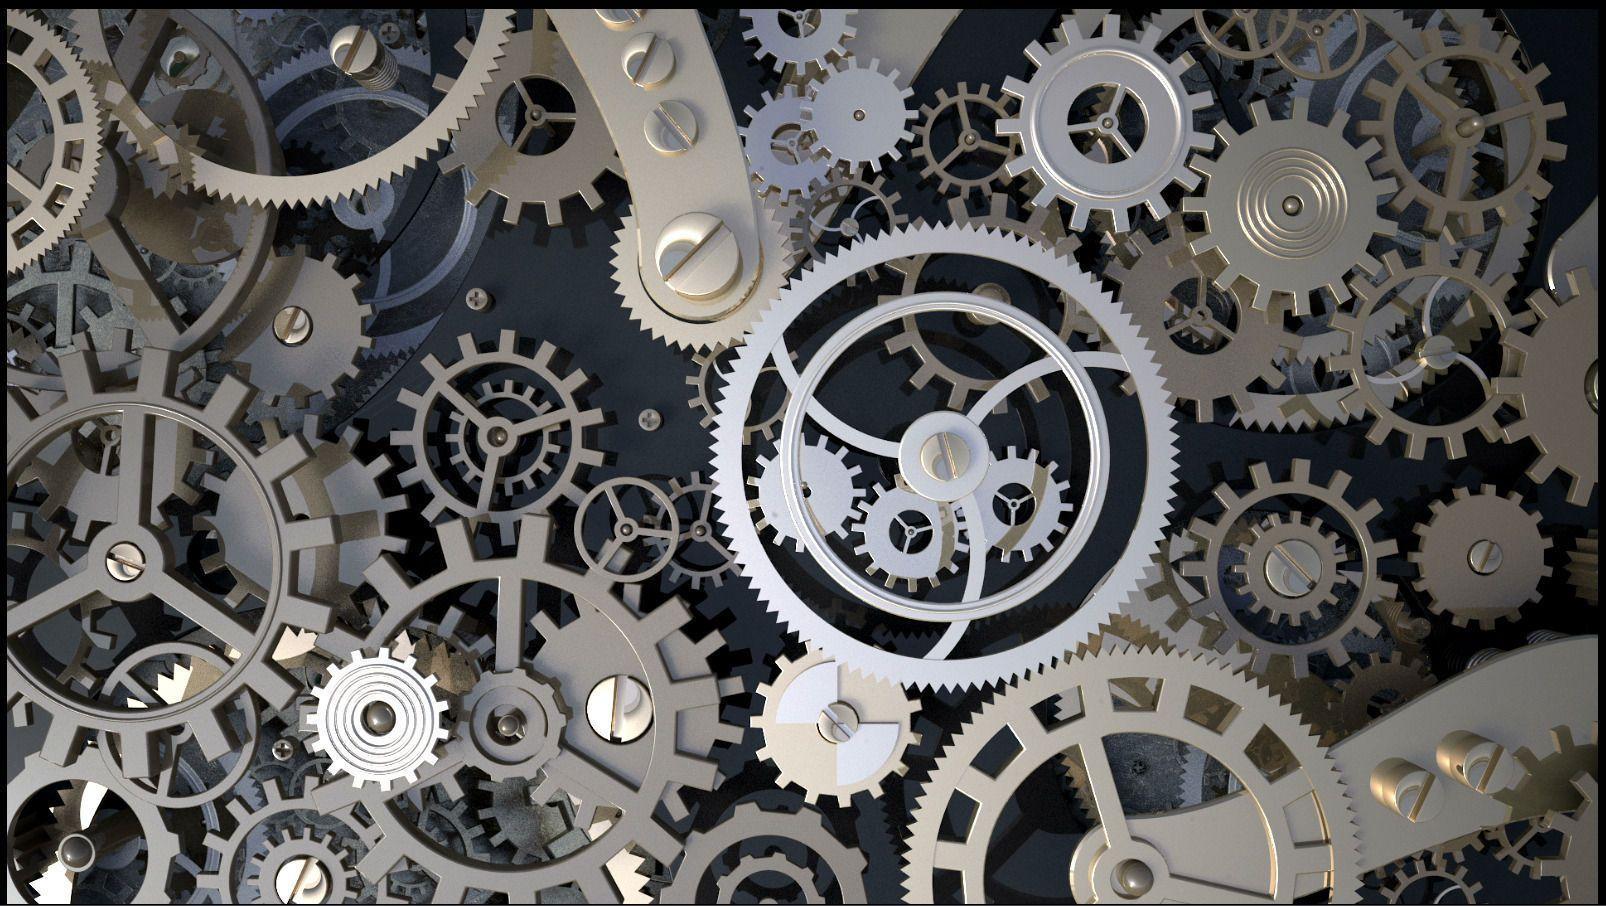 Background With Metal Cogwheels A Clockwork 3d Model Clockwork Stock Images Free Metal